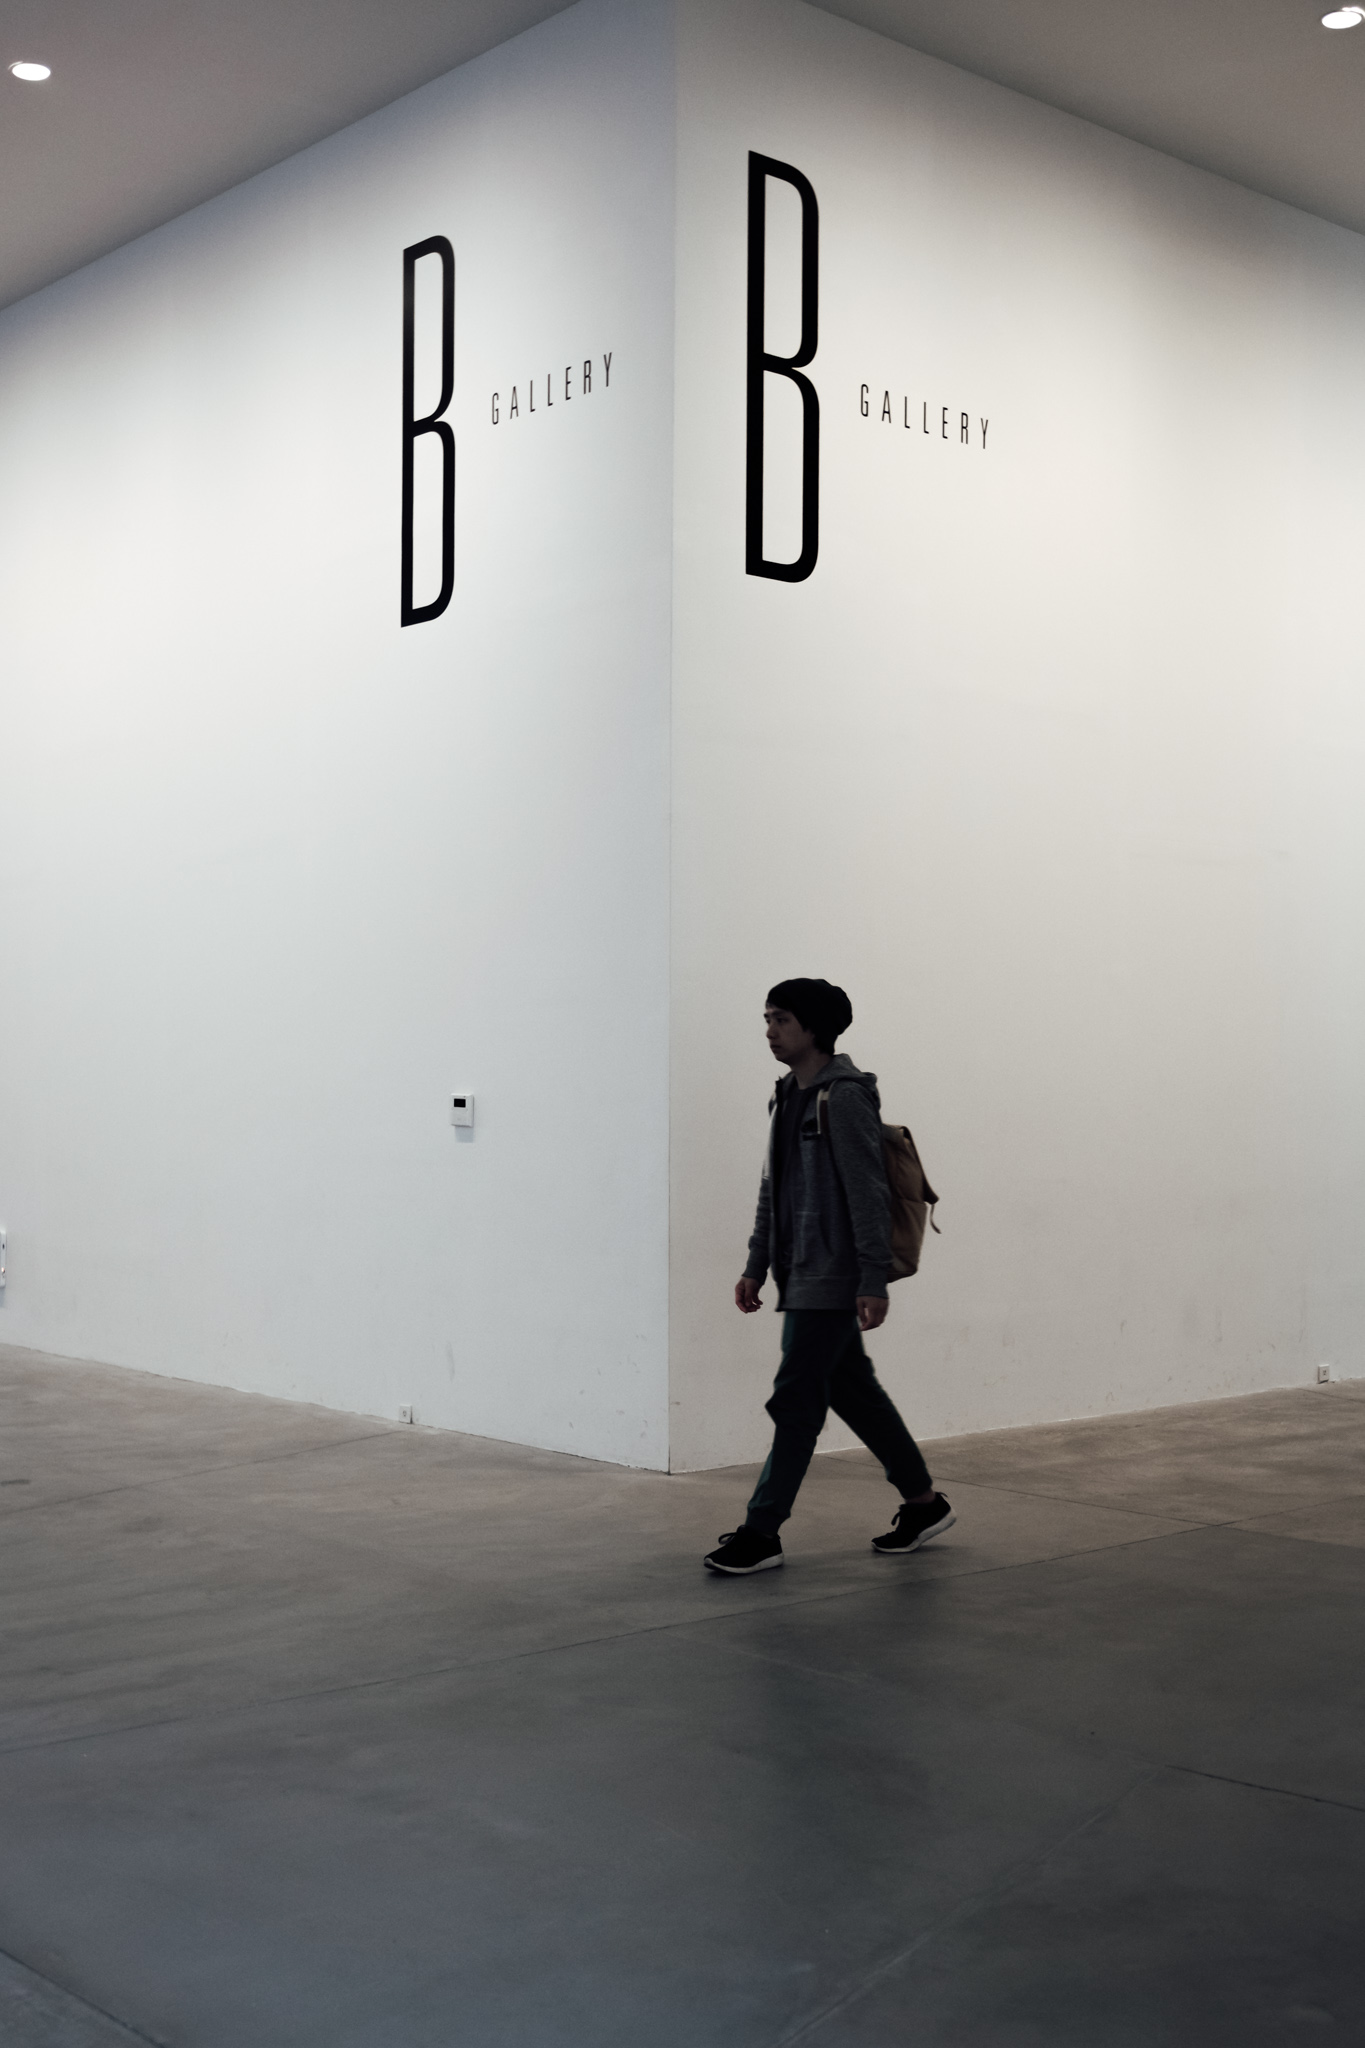 - 臺南市美術館2館 – Inside of a newly built Tainan City Art Museum Building 2